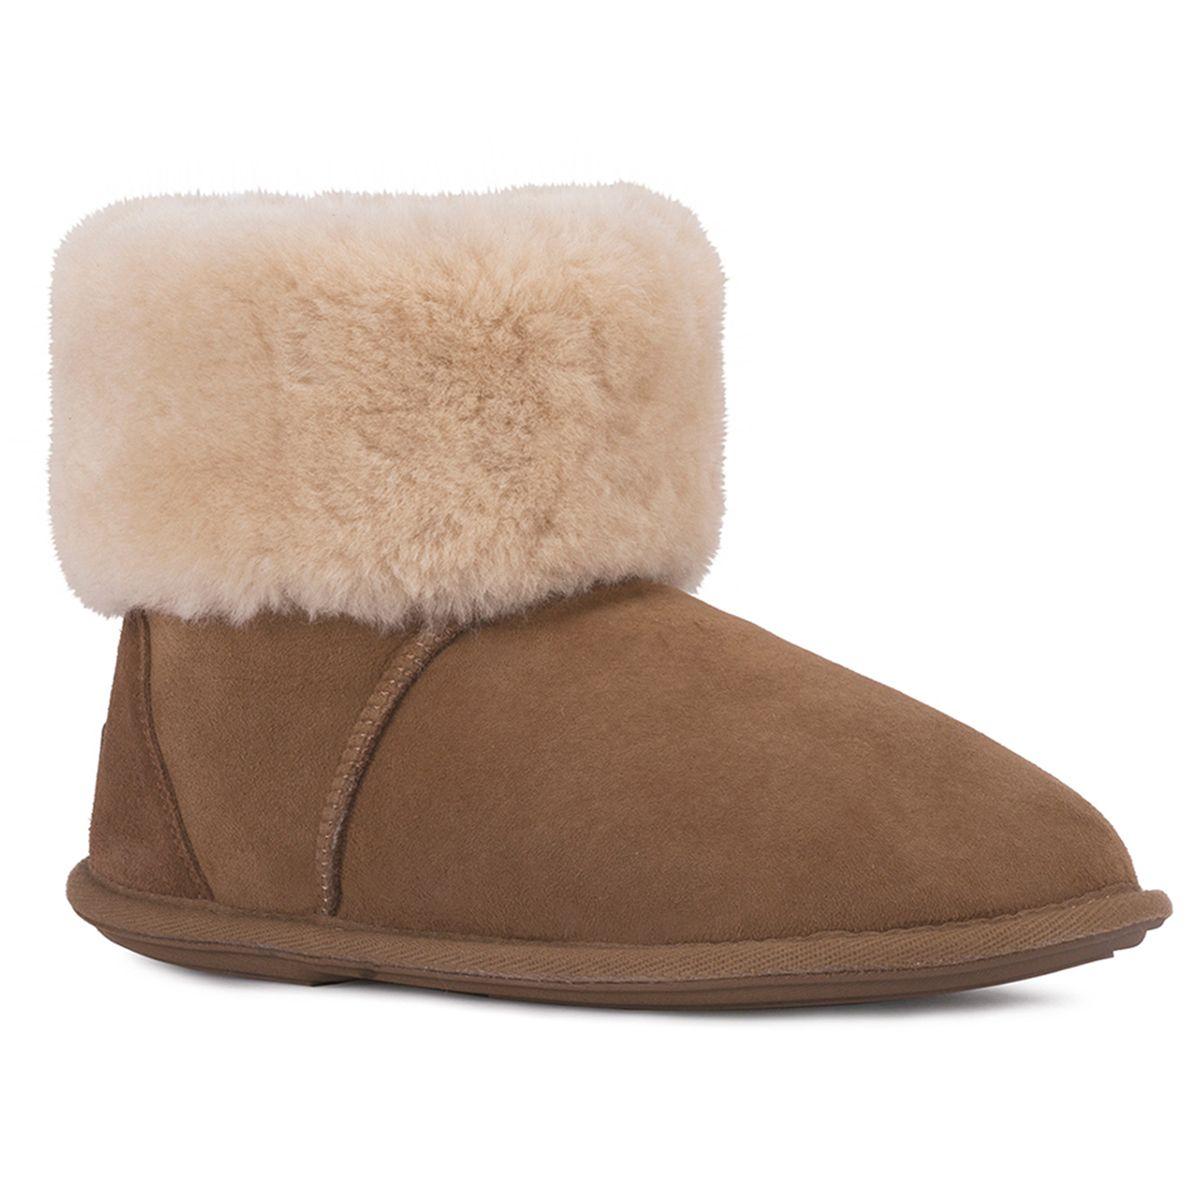 609ae3d682ac Ladies Albery Sheepskin Slippers Chestnut - Just Sheepskin